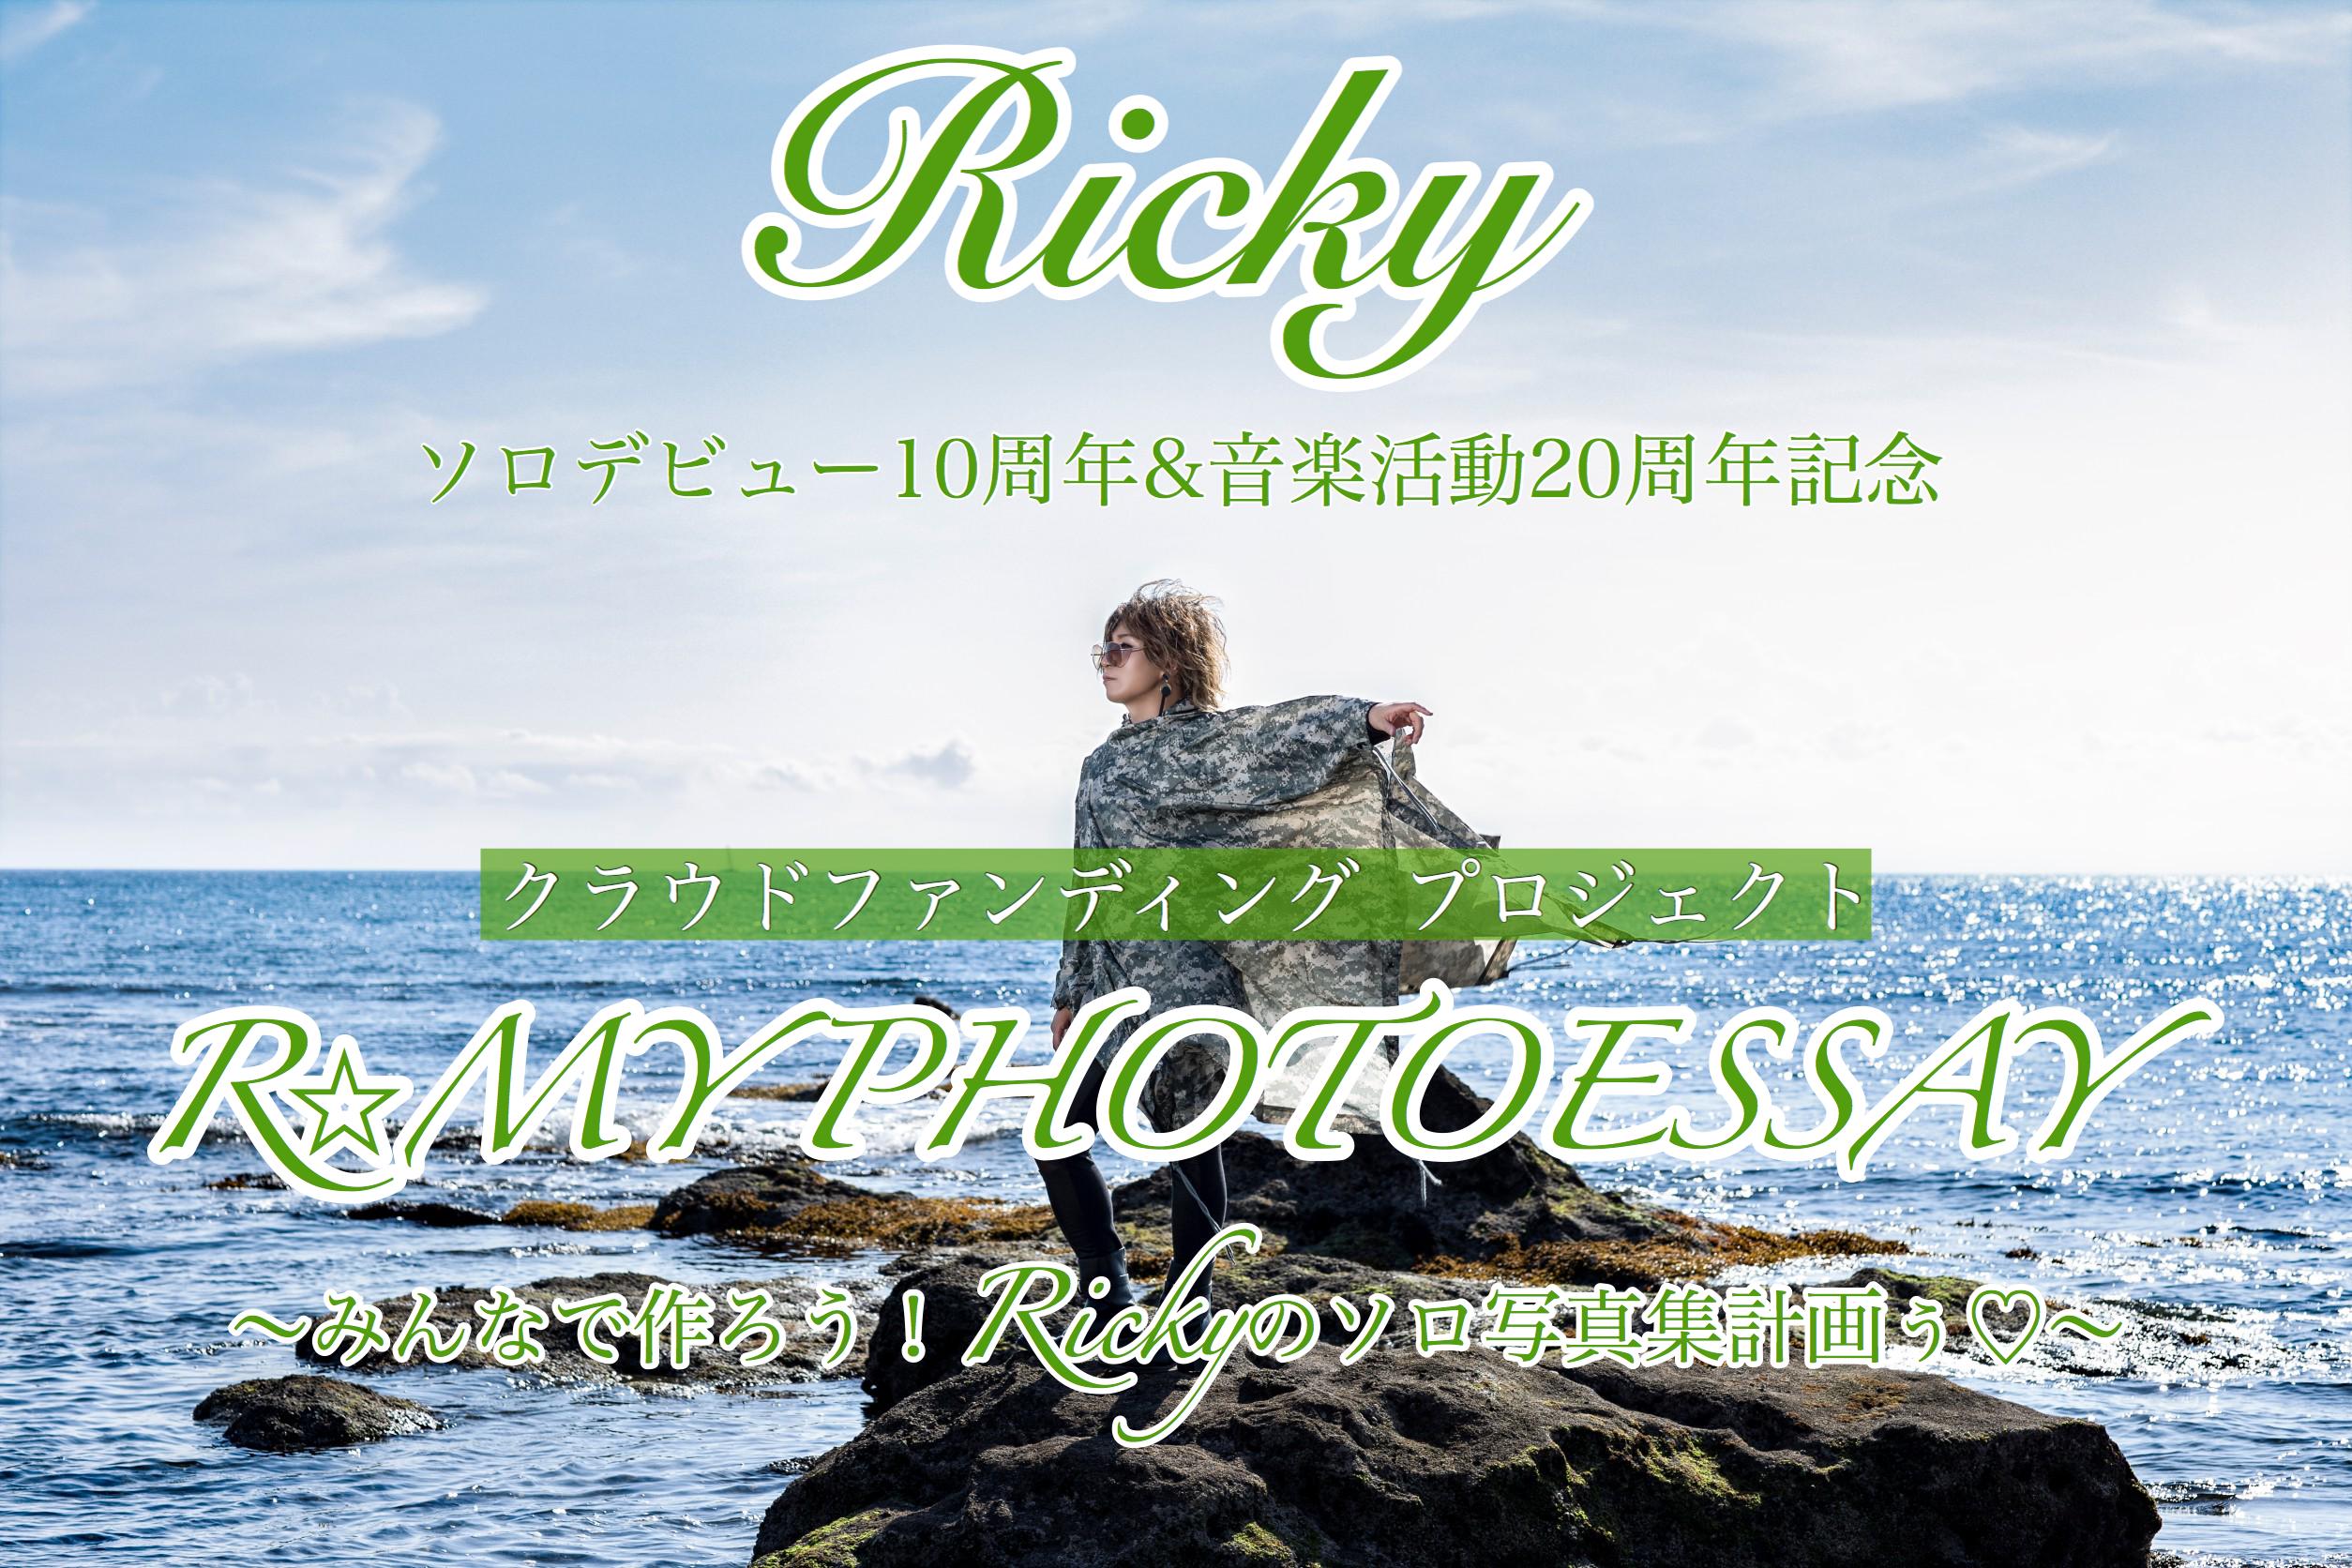 HYPER NEO SOLOIST【Ricky】ソロデビュー10周年記念!写真集制作プロジェクト!!